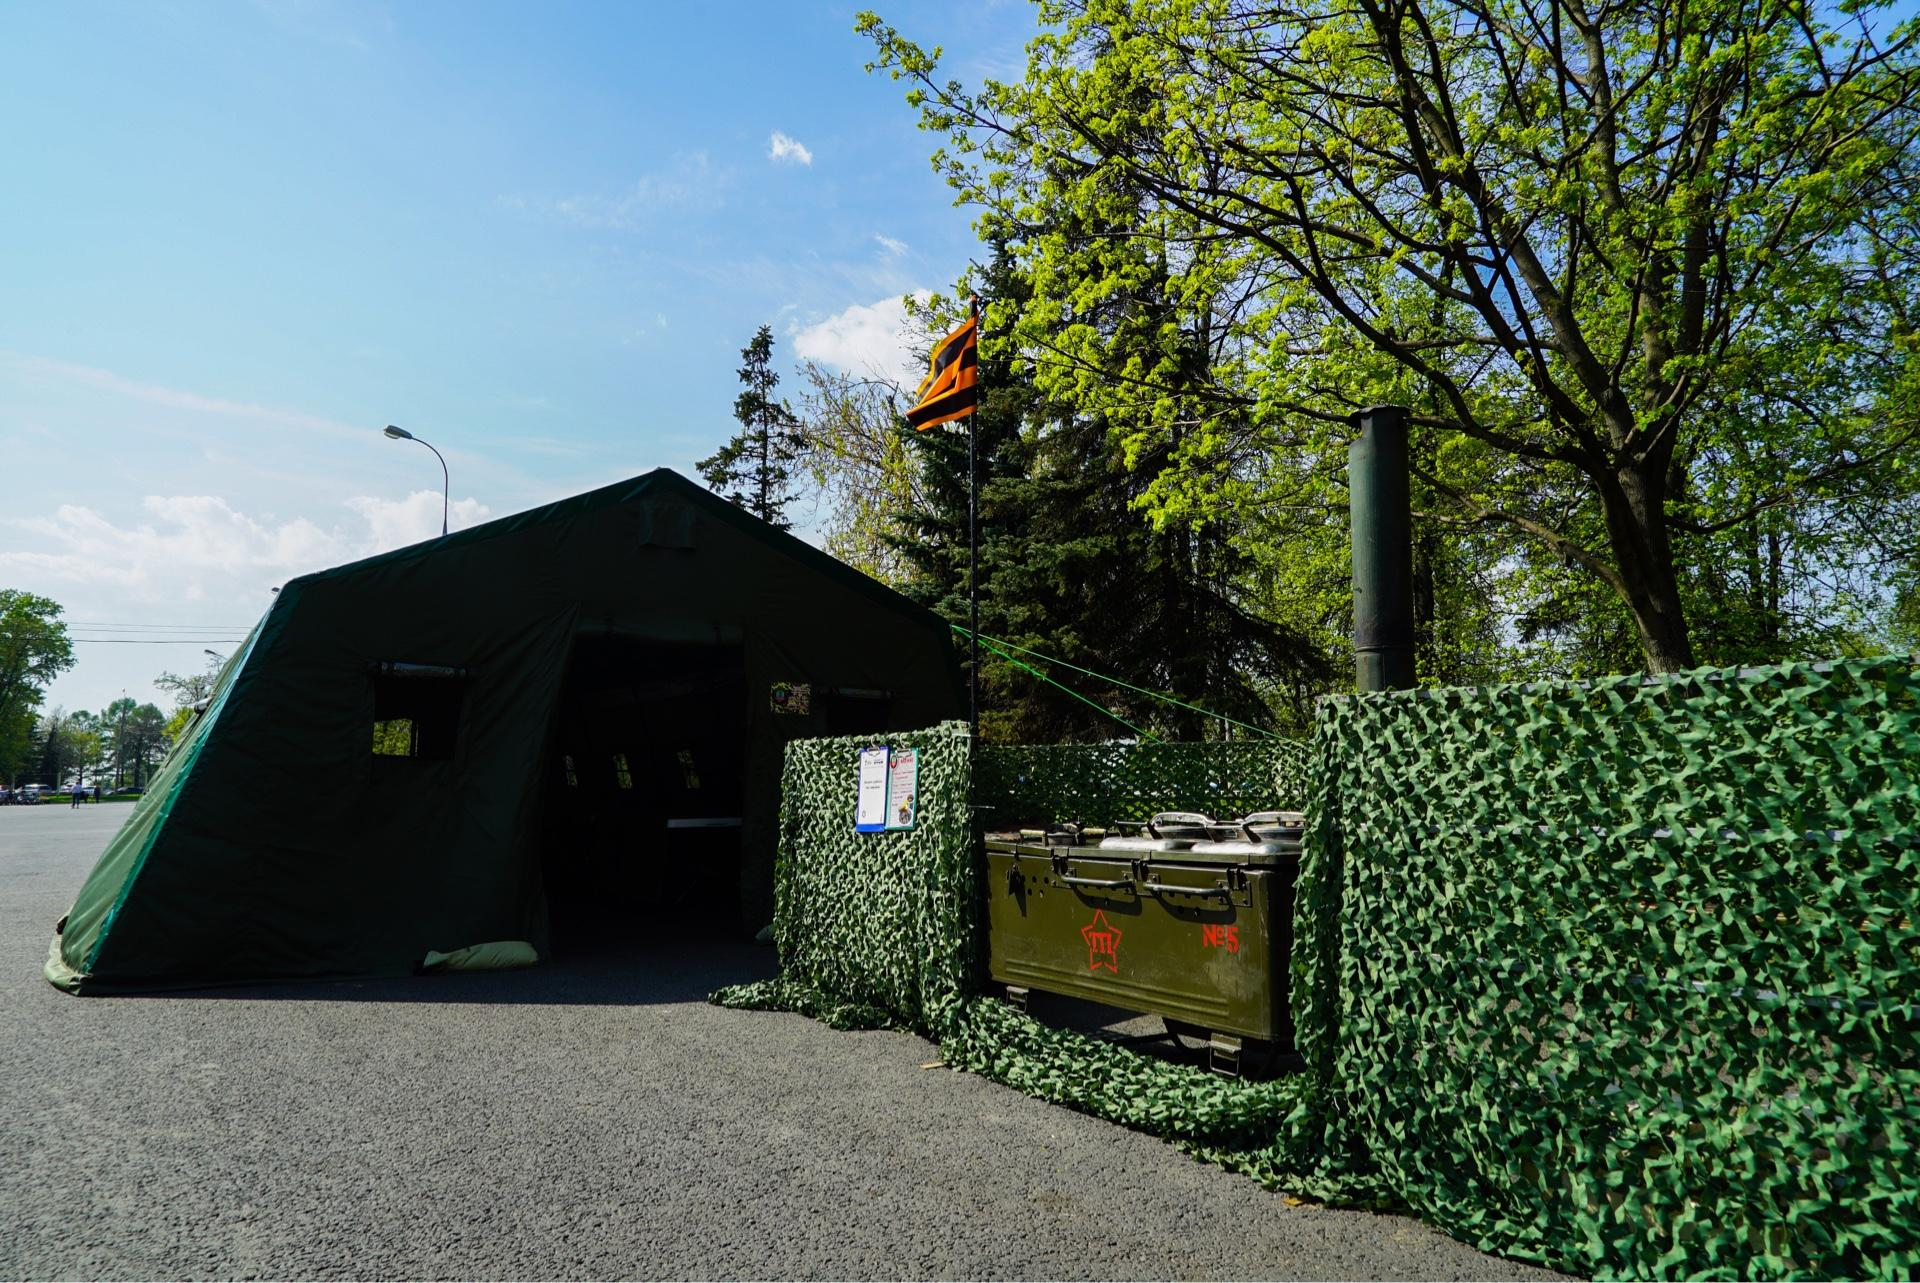 Большой армейский шатер